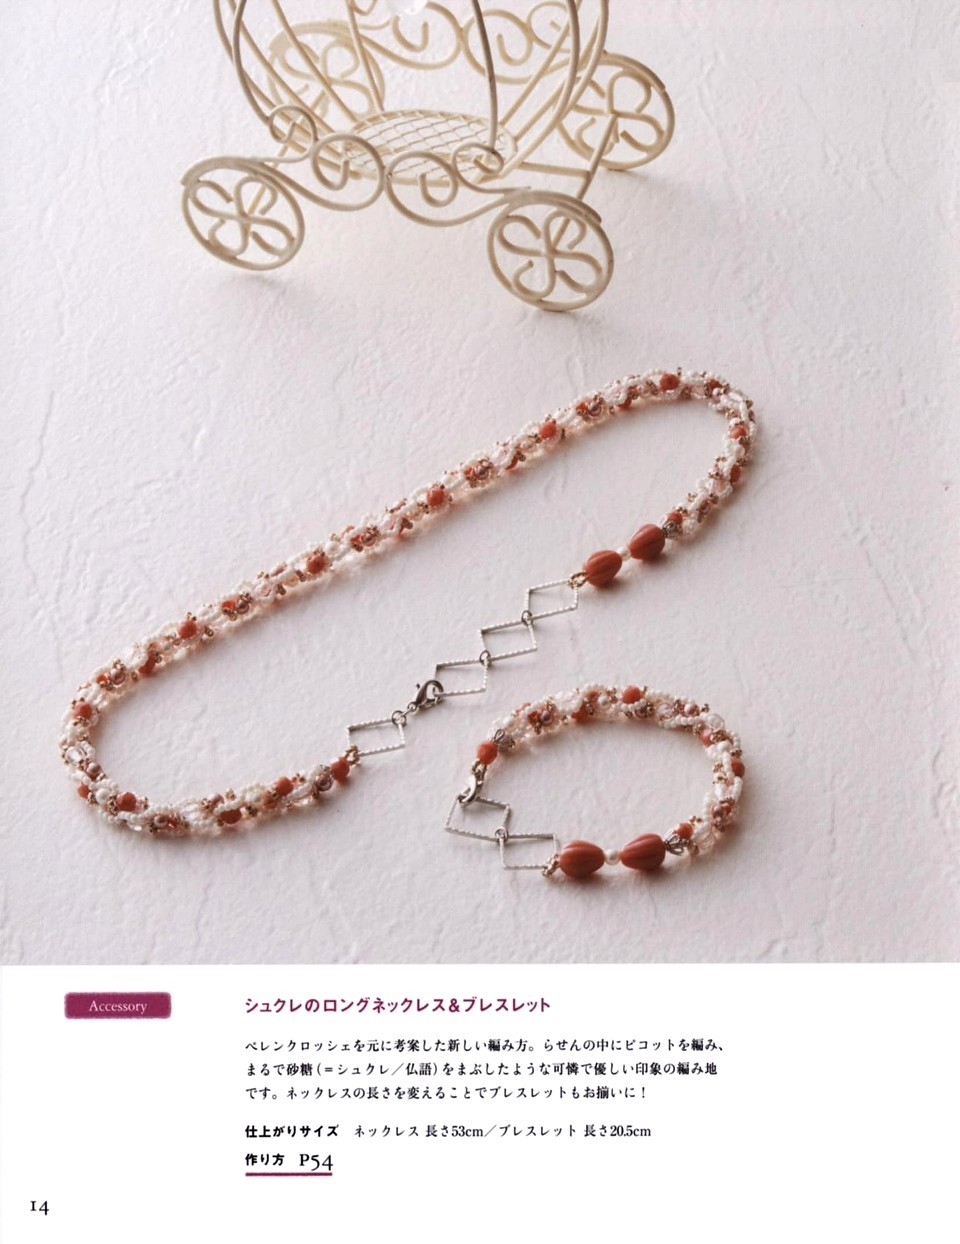 717 Beads Crochet 17-15